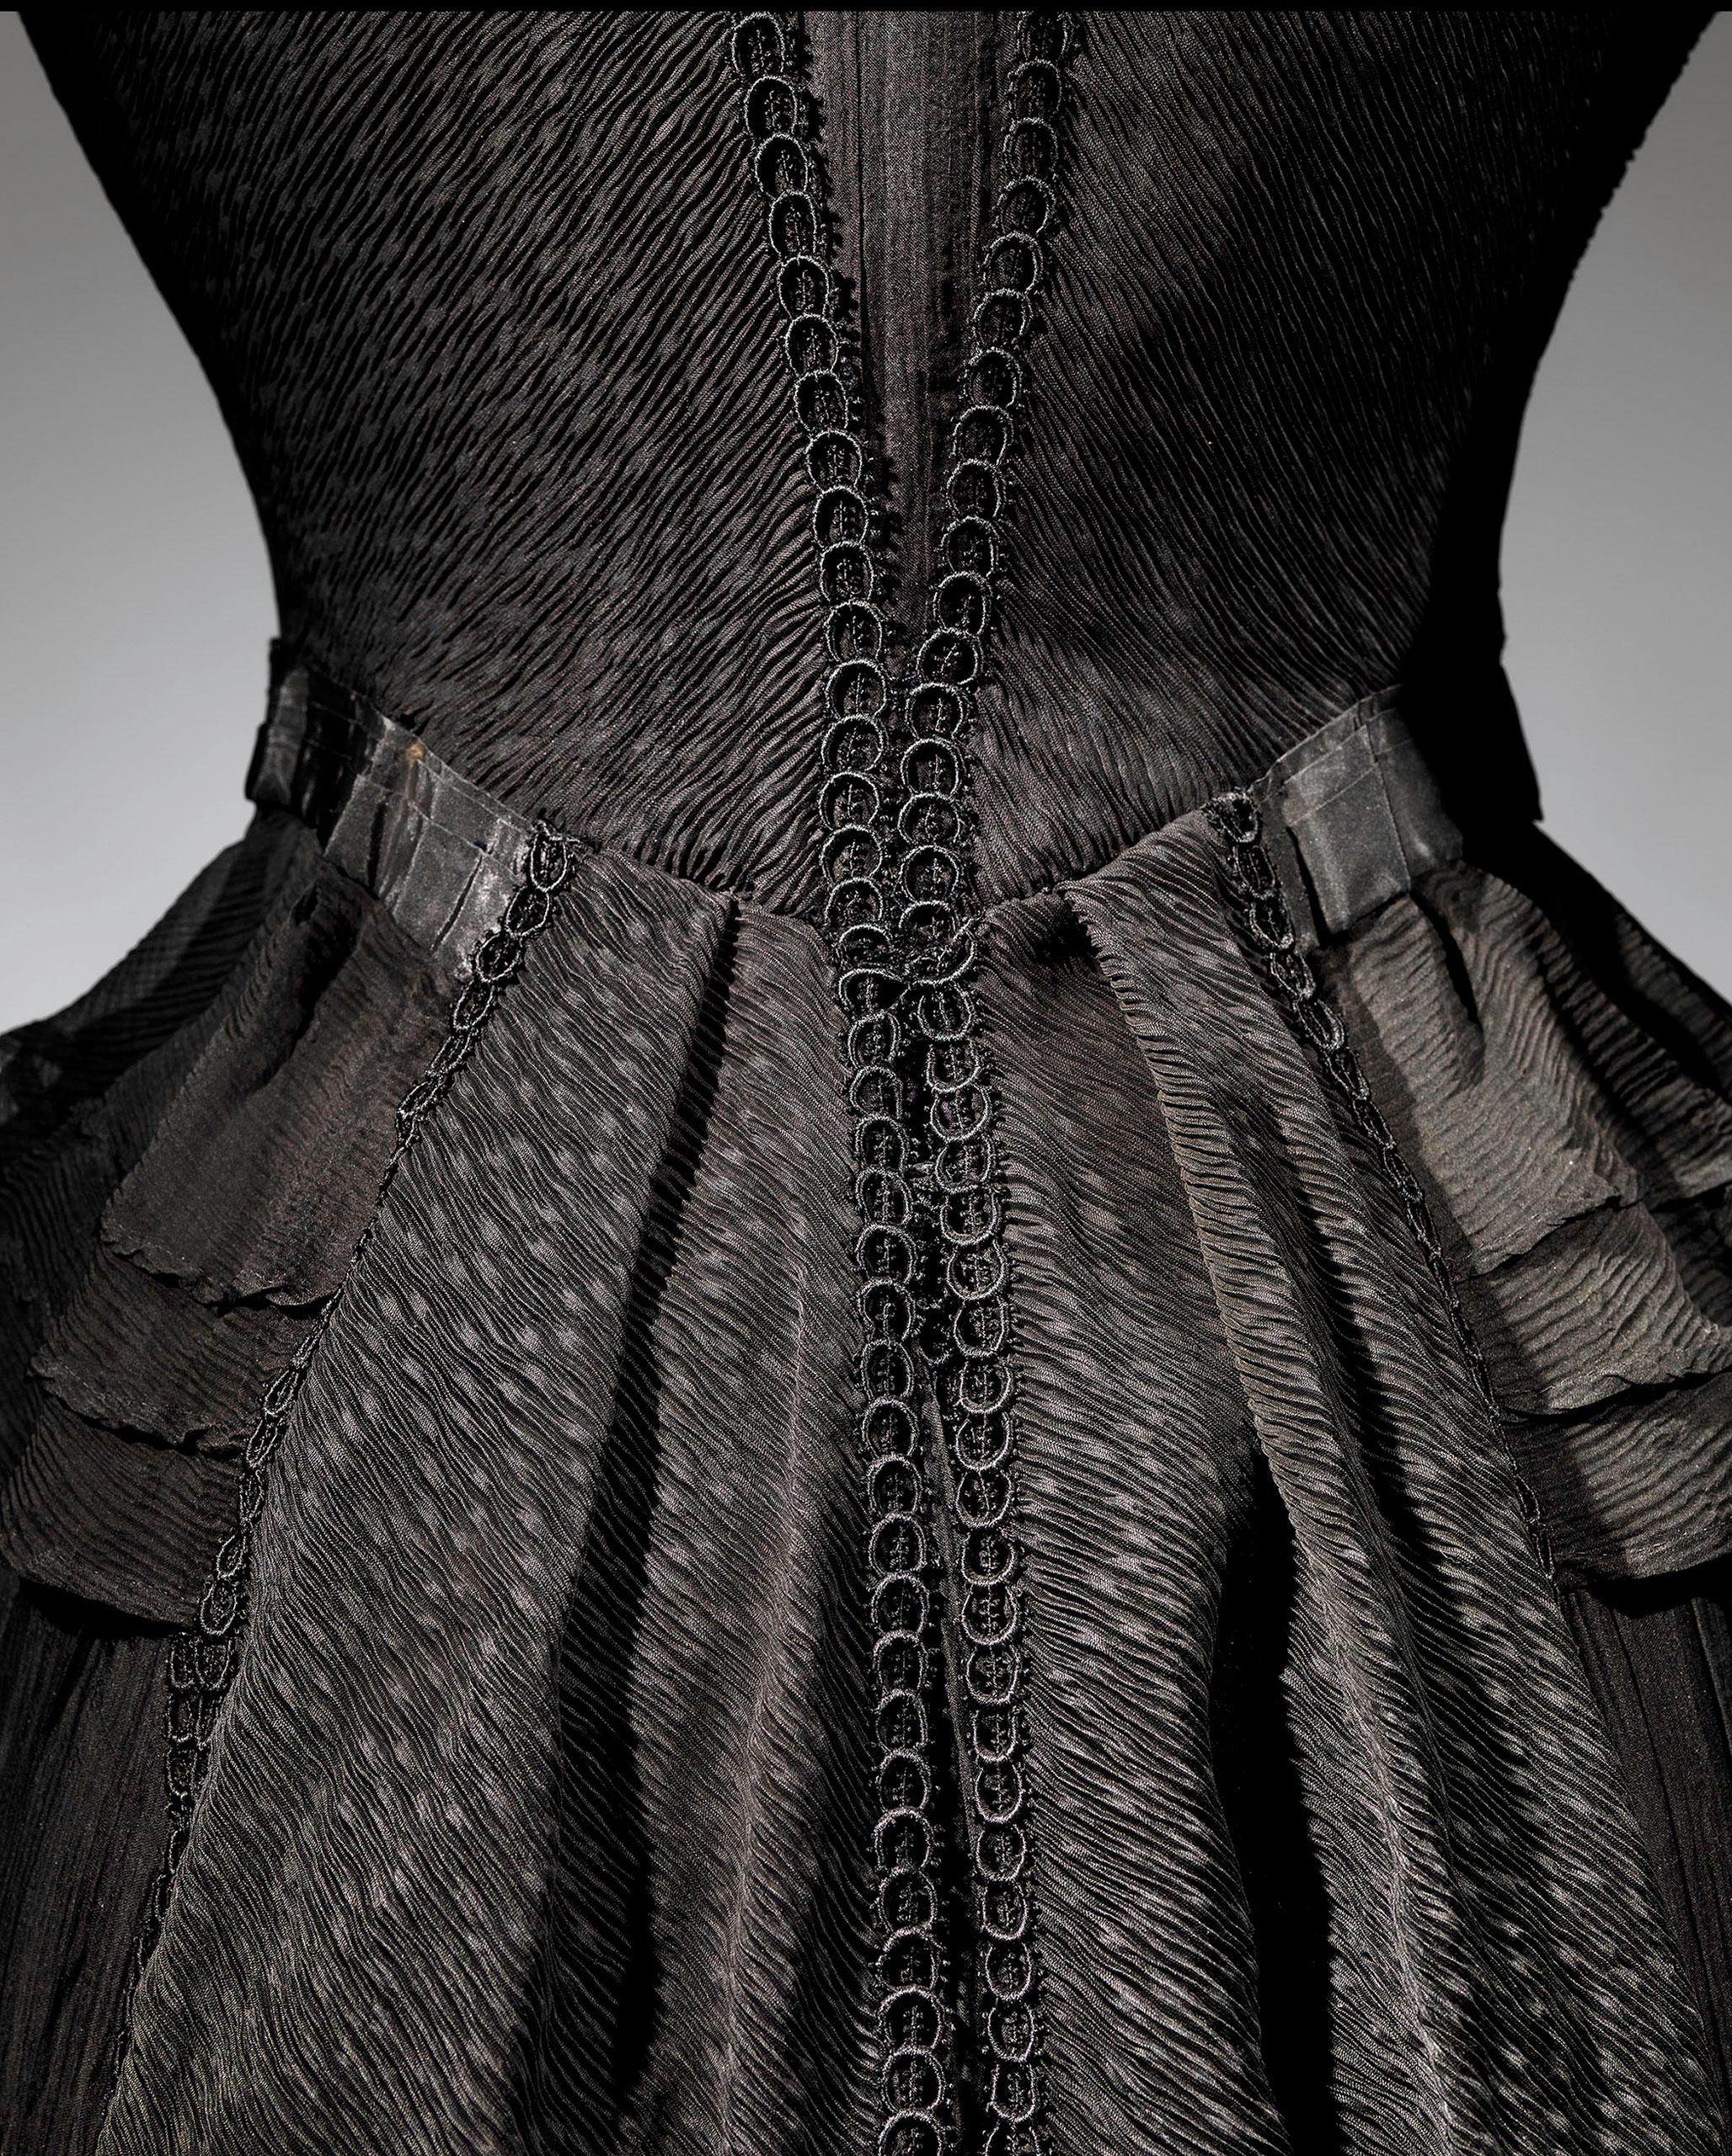 <strong>Mourning Dress (Detail), 1902-1904</strong>                                    Black silk crape, black chiffon, black taffeta